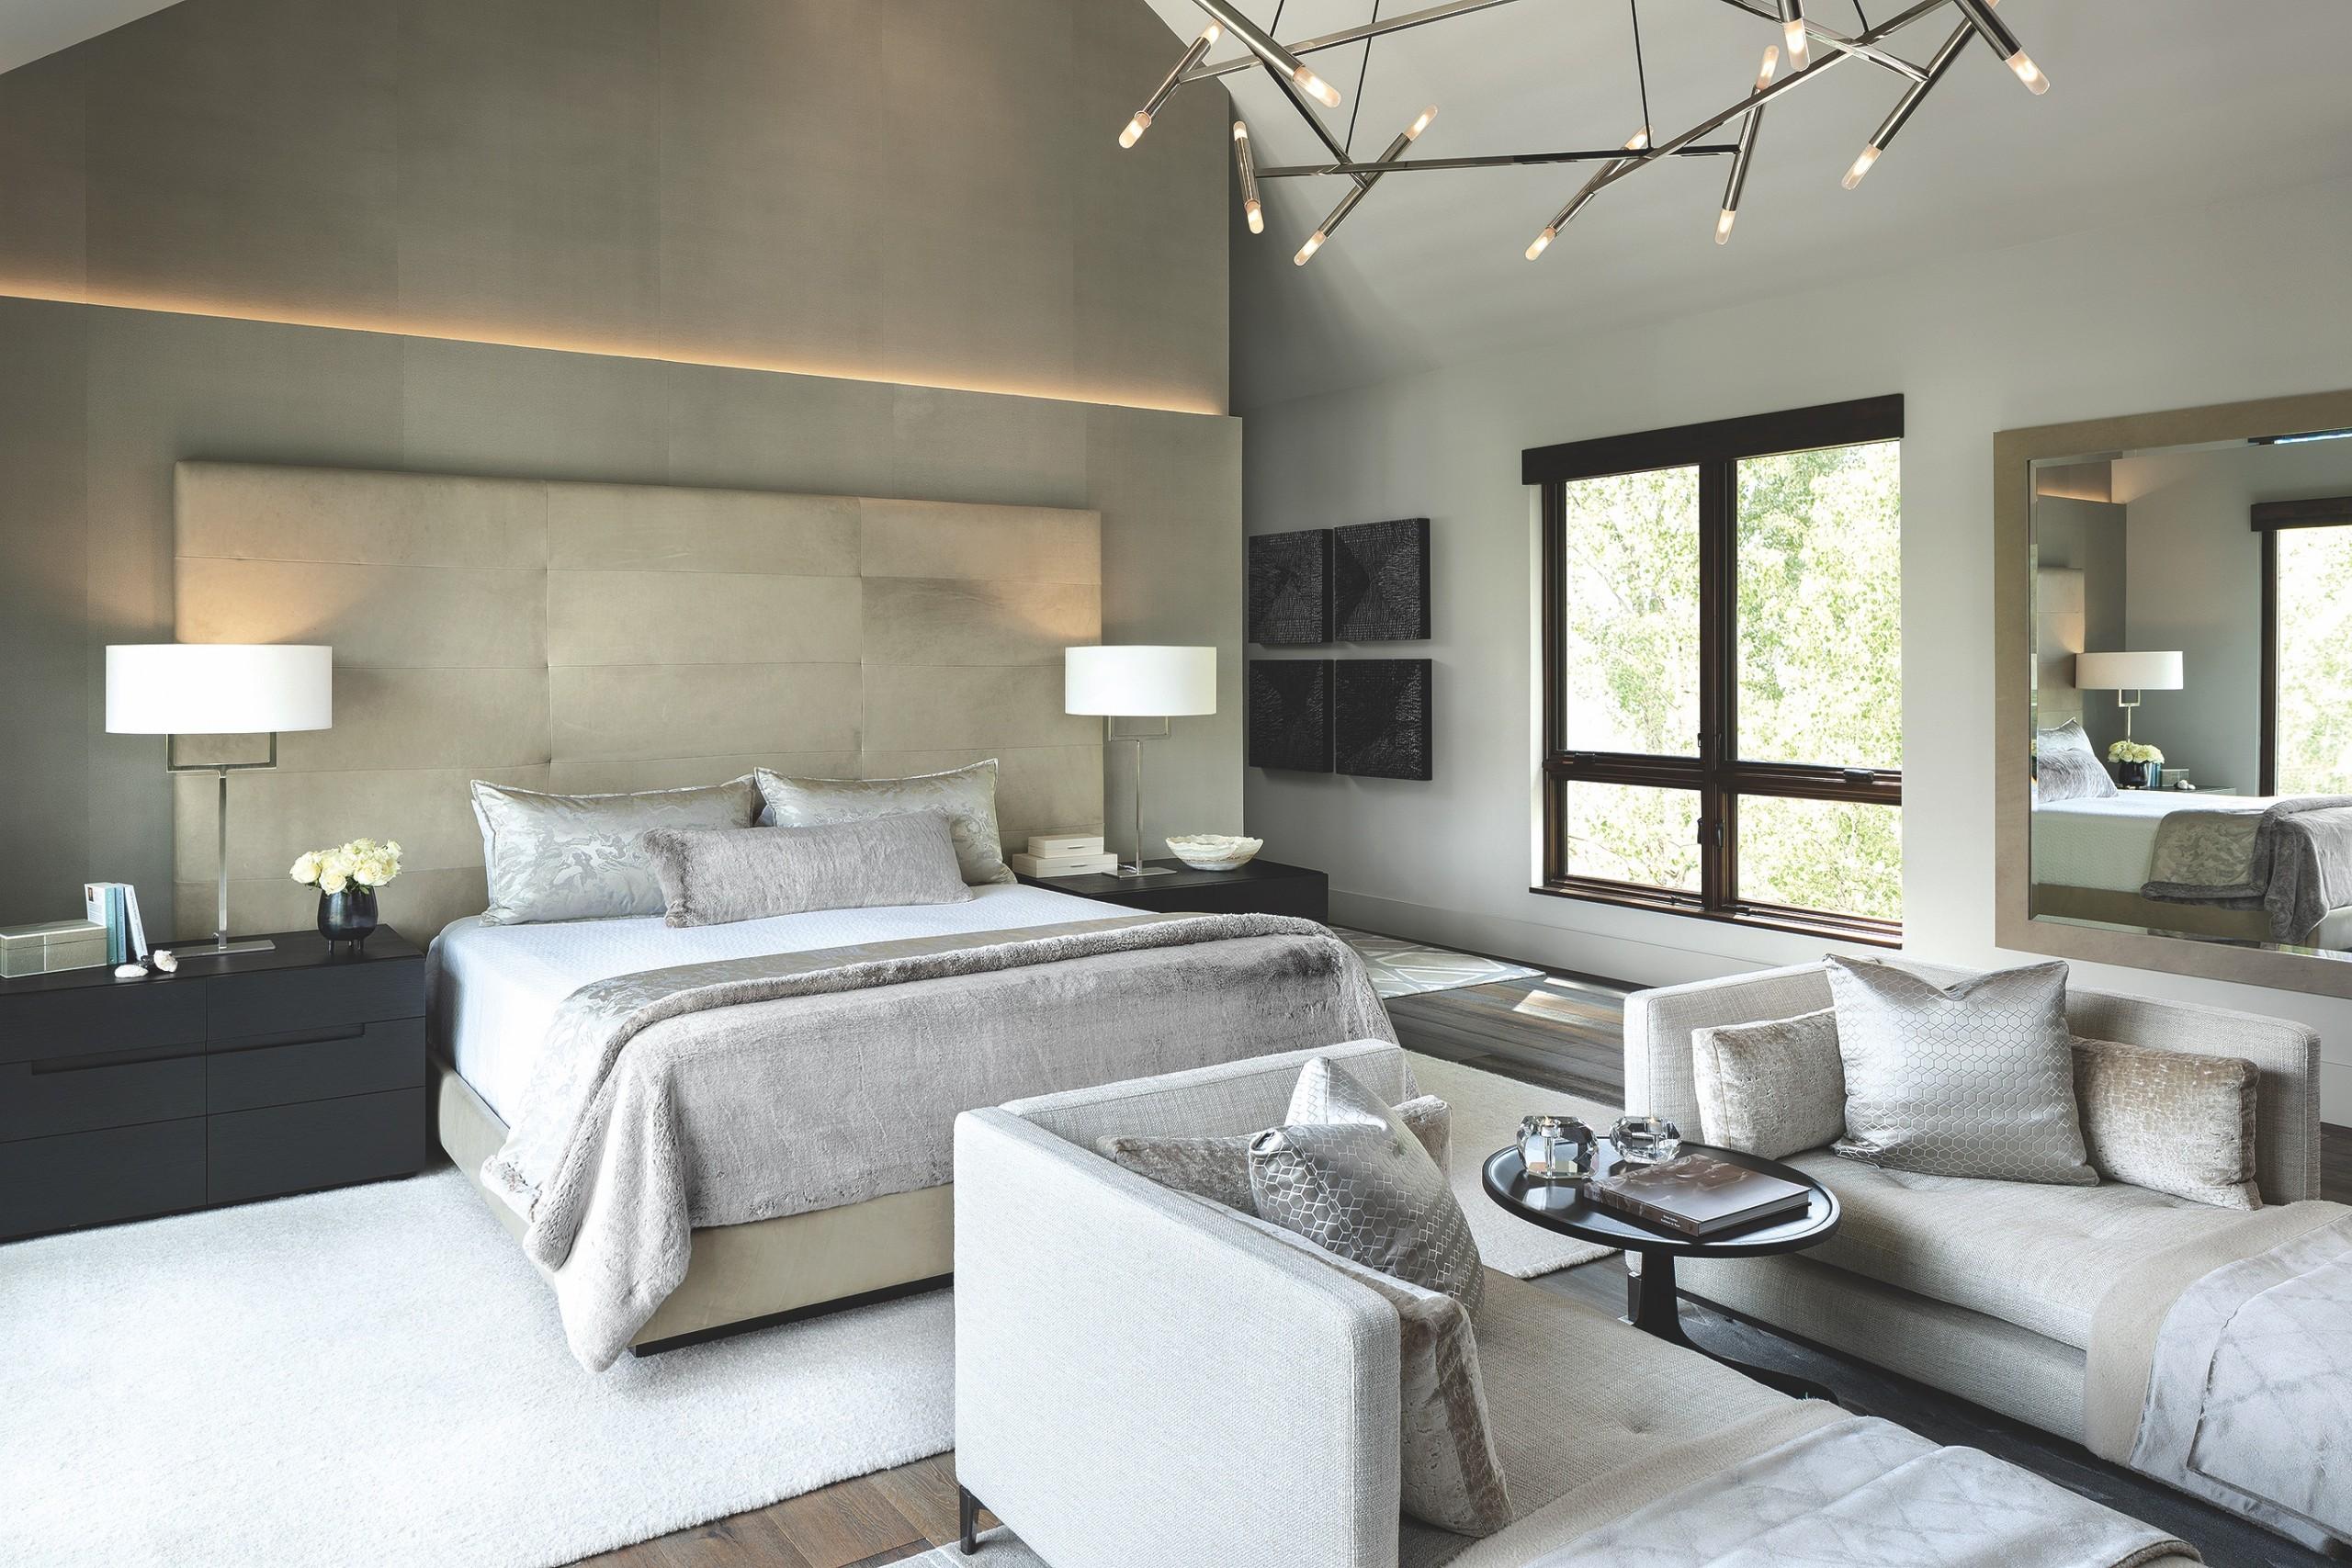 Interiors Bed